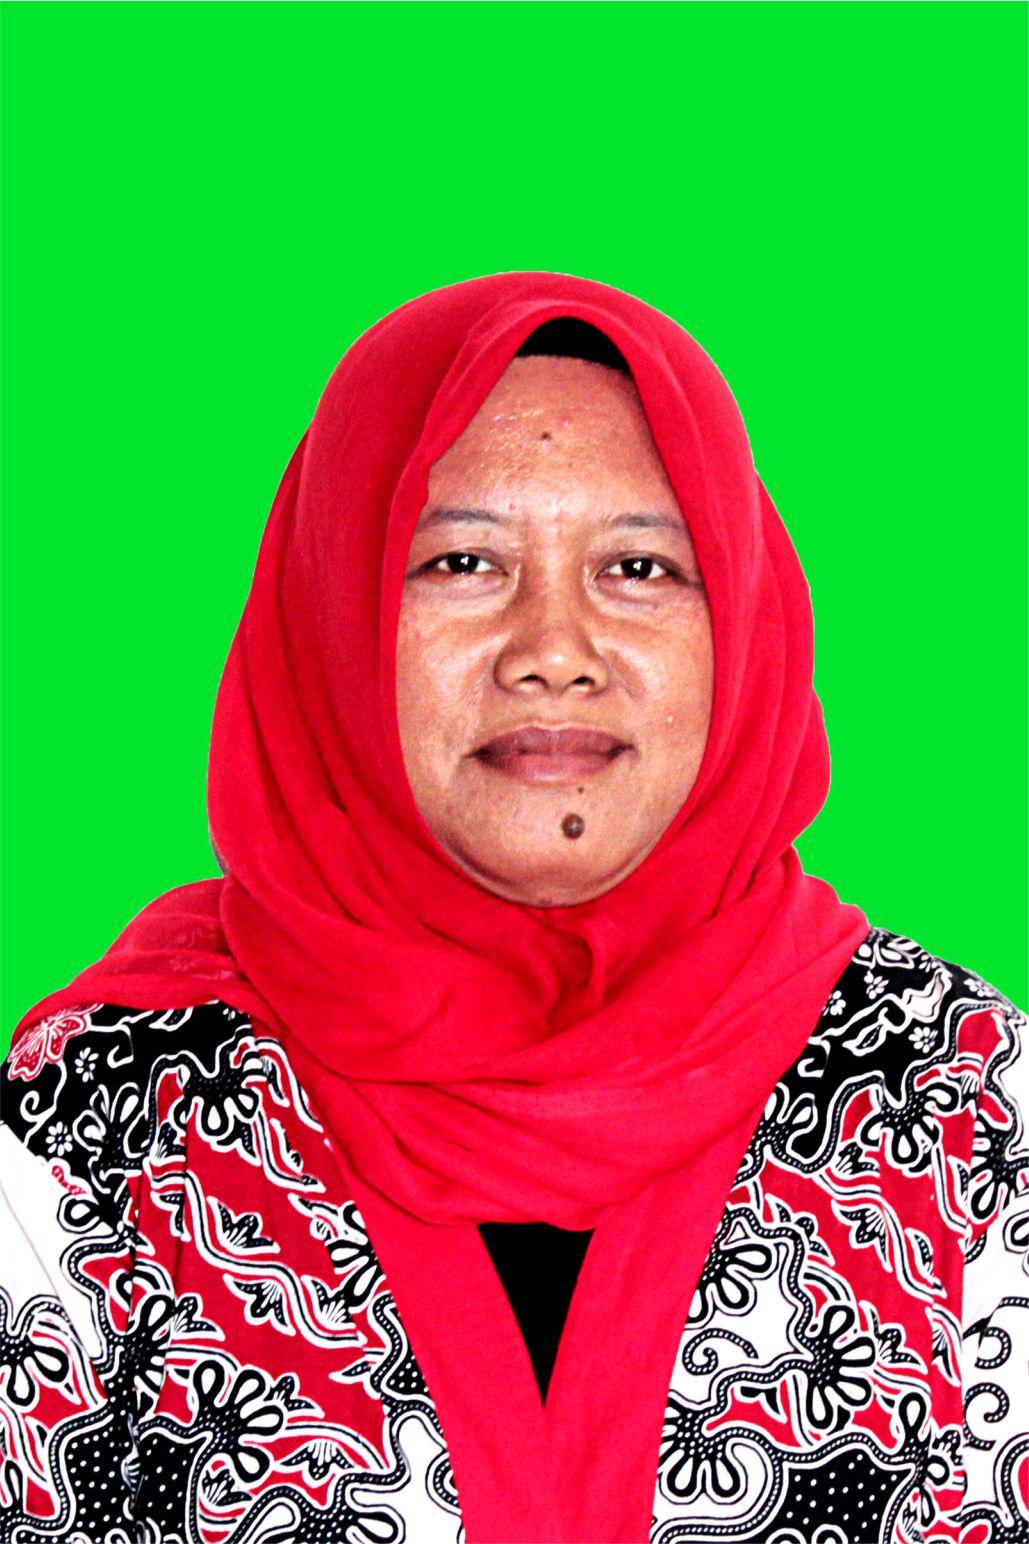 Staff Umi Arifiyyah, S.Pd SMK Taruna Harapan 1 Cipatat